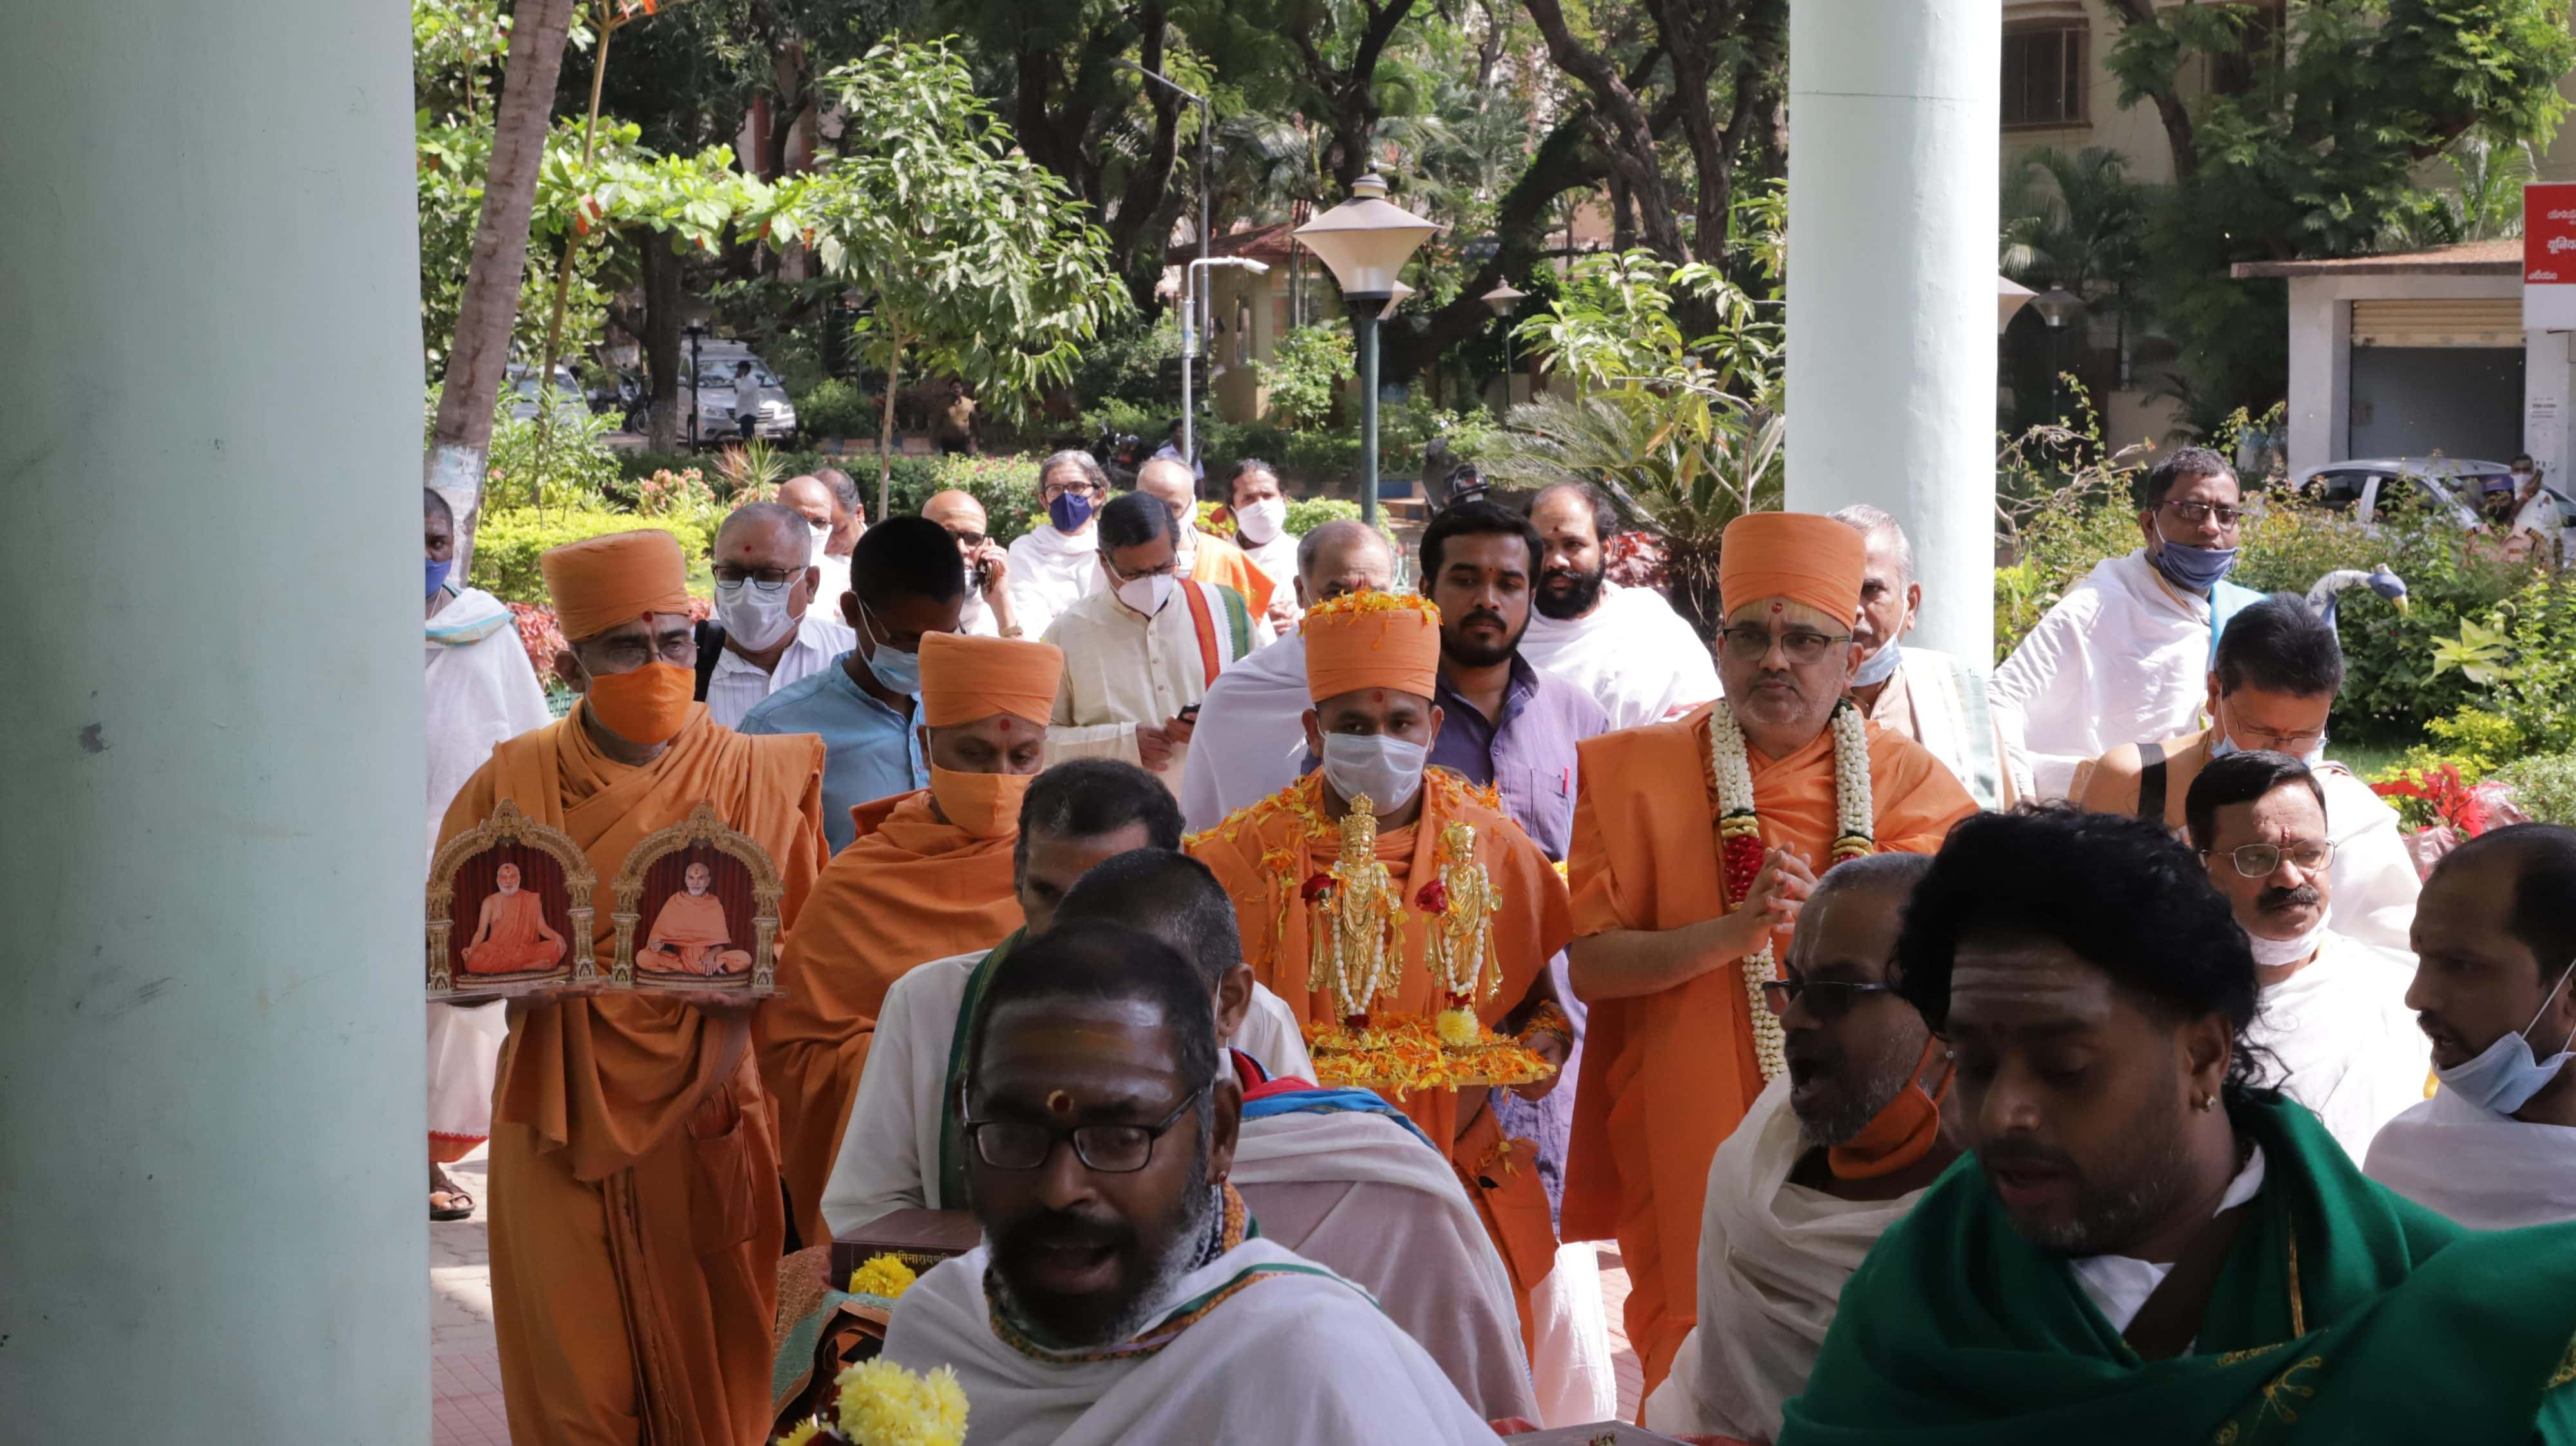 Procession Celebrating the Akṣara-Puruṣottama Darśana